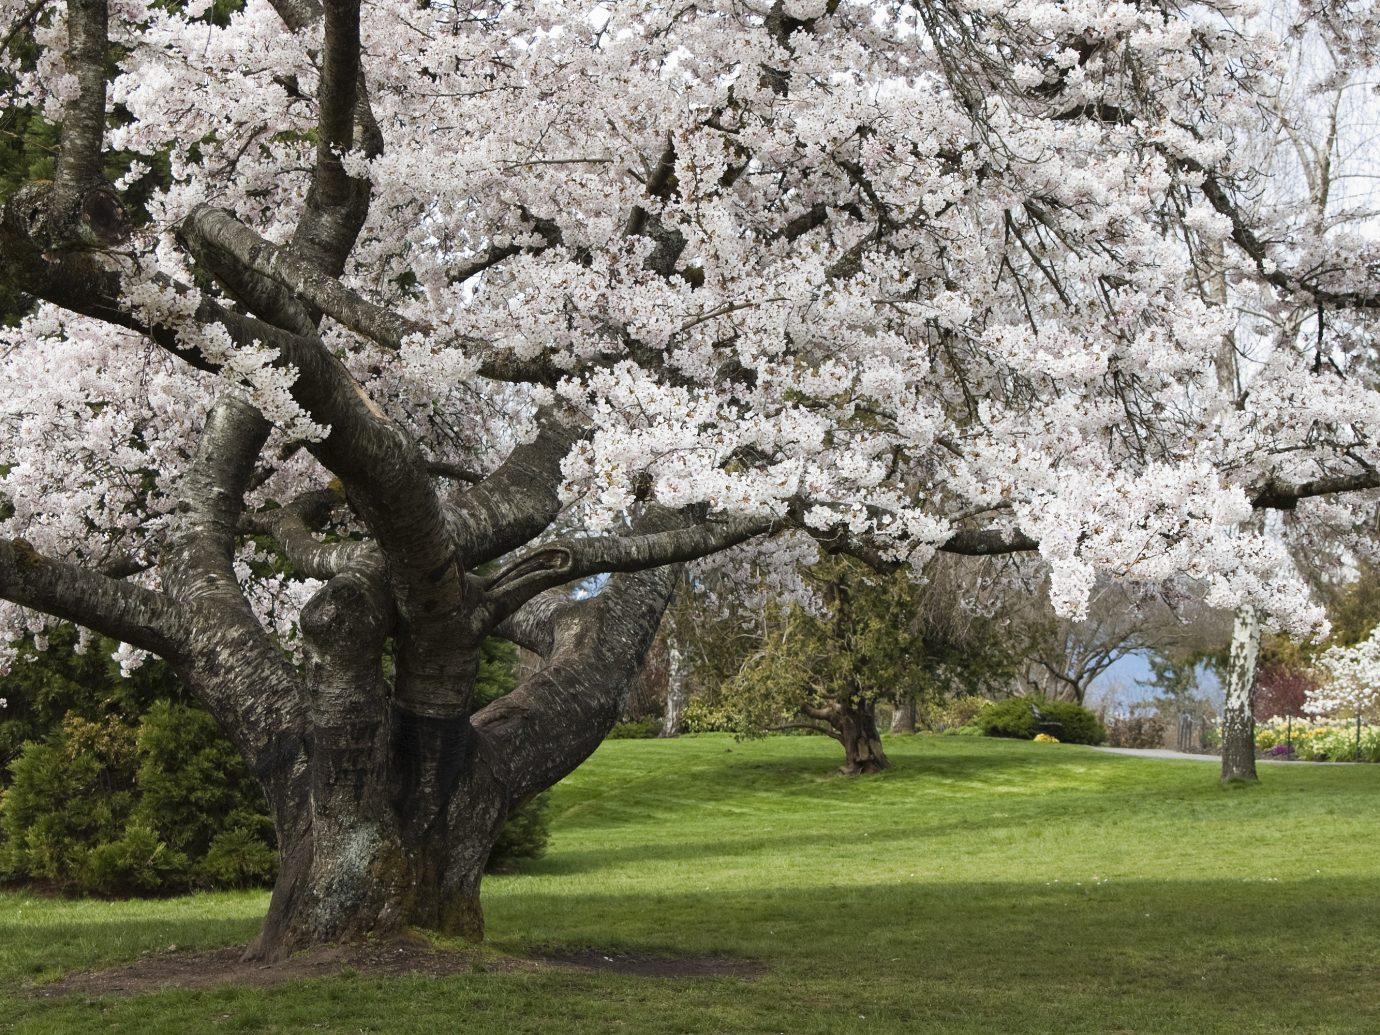 Offbeat tree grass outdoor flower plant field blossom cherry blossom botany park spring oak lush